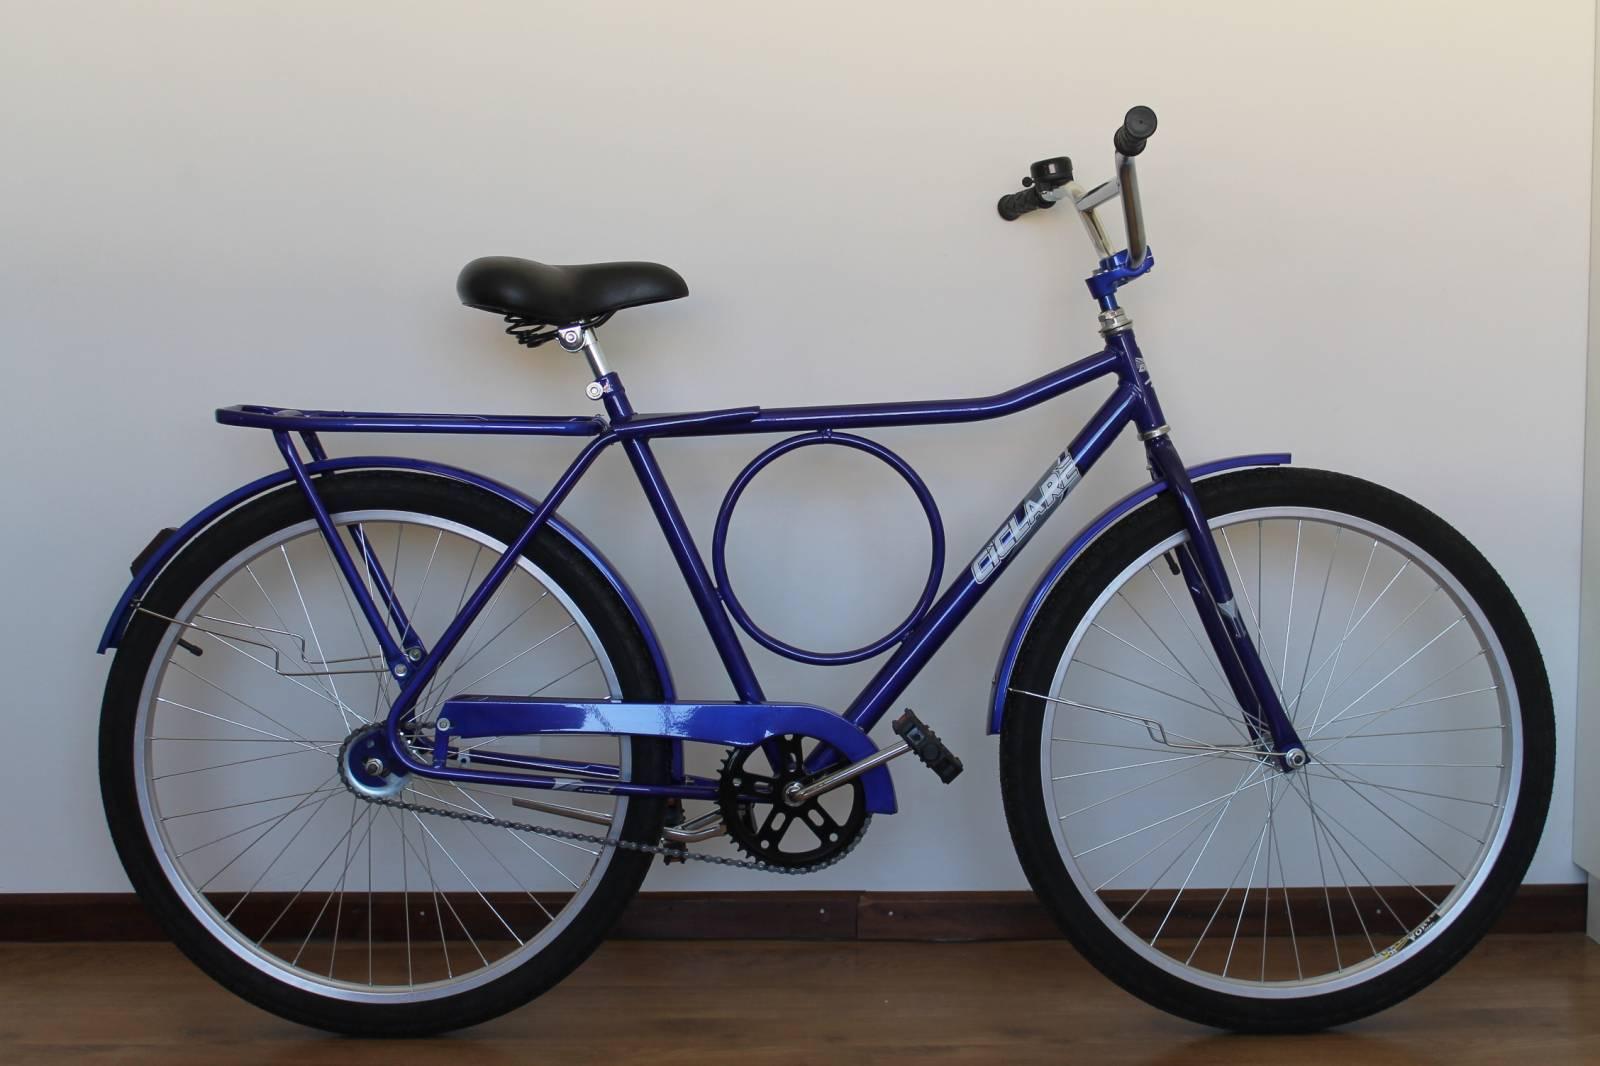 Bicicleta Agile Barra Aro 26 Modelos - Bike Portella